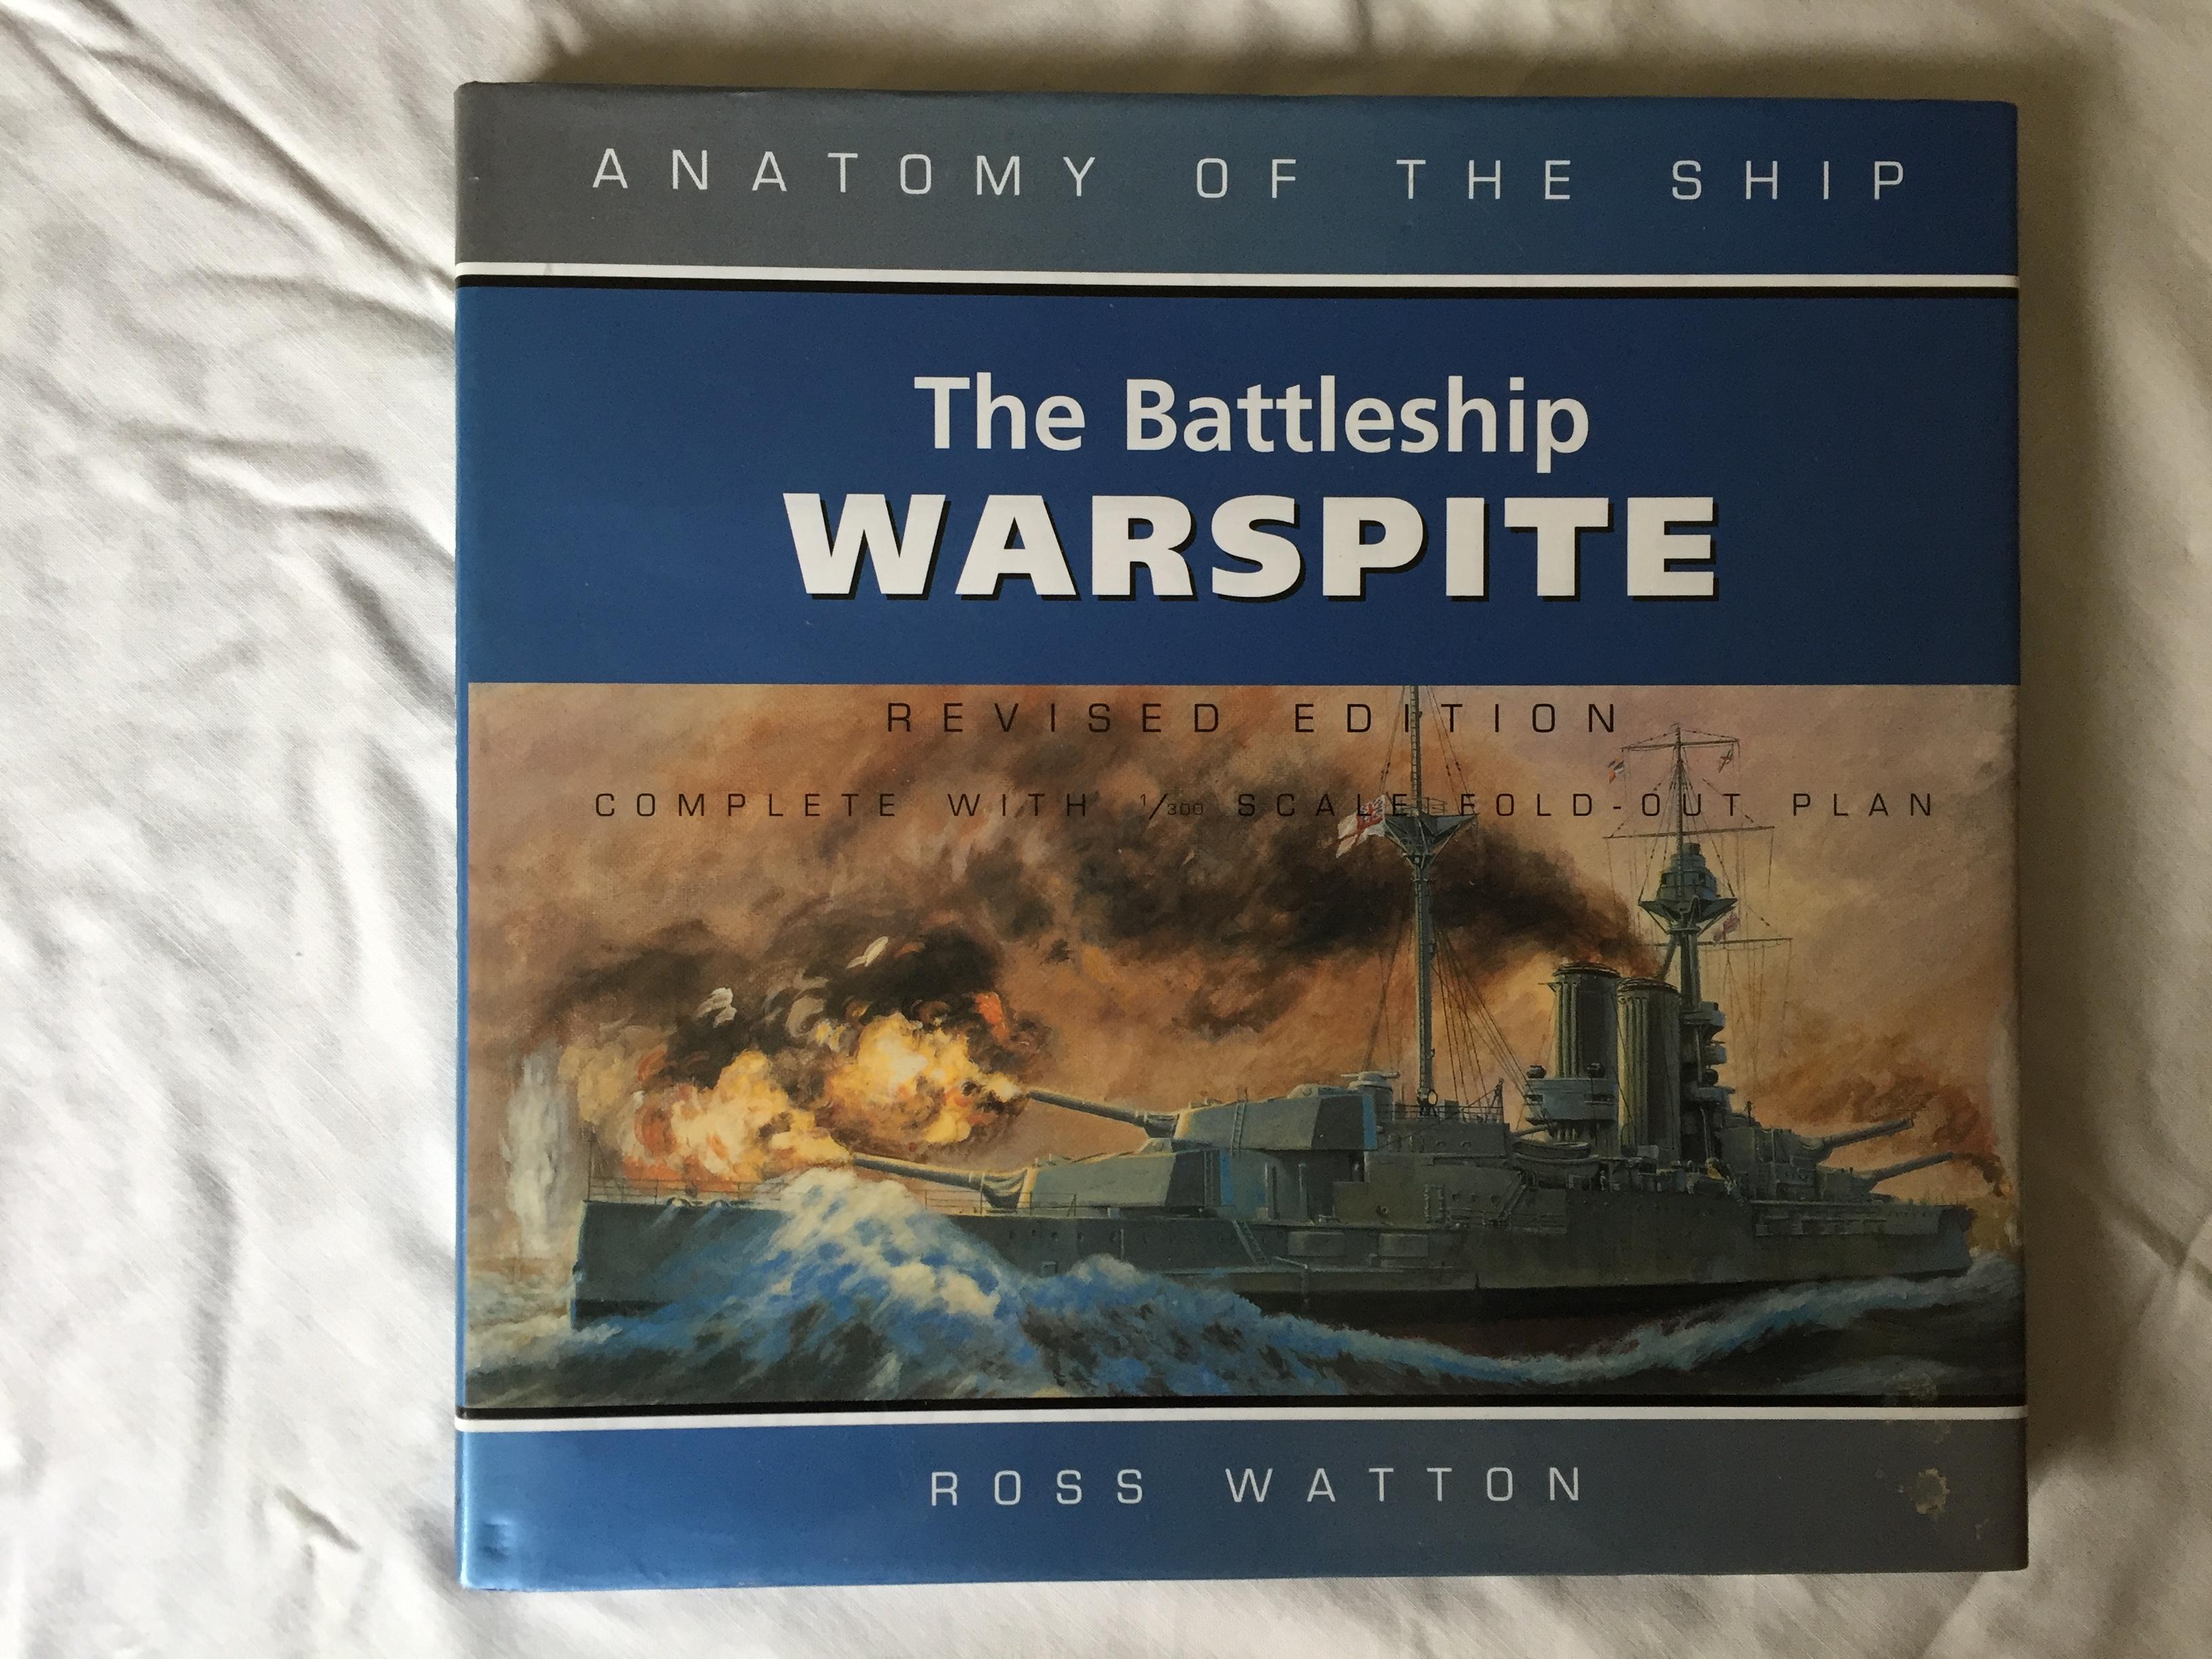 FANTASTIC BOOK 'THE BATTLESHIP WARSPITE' BY ROSS WATTON